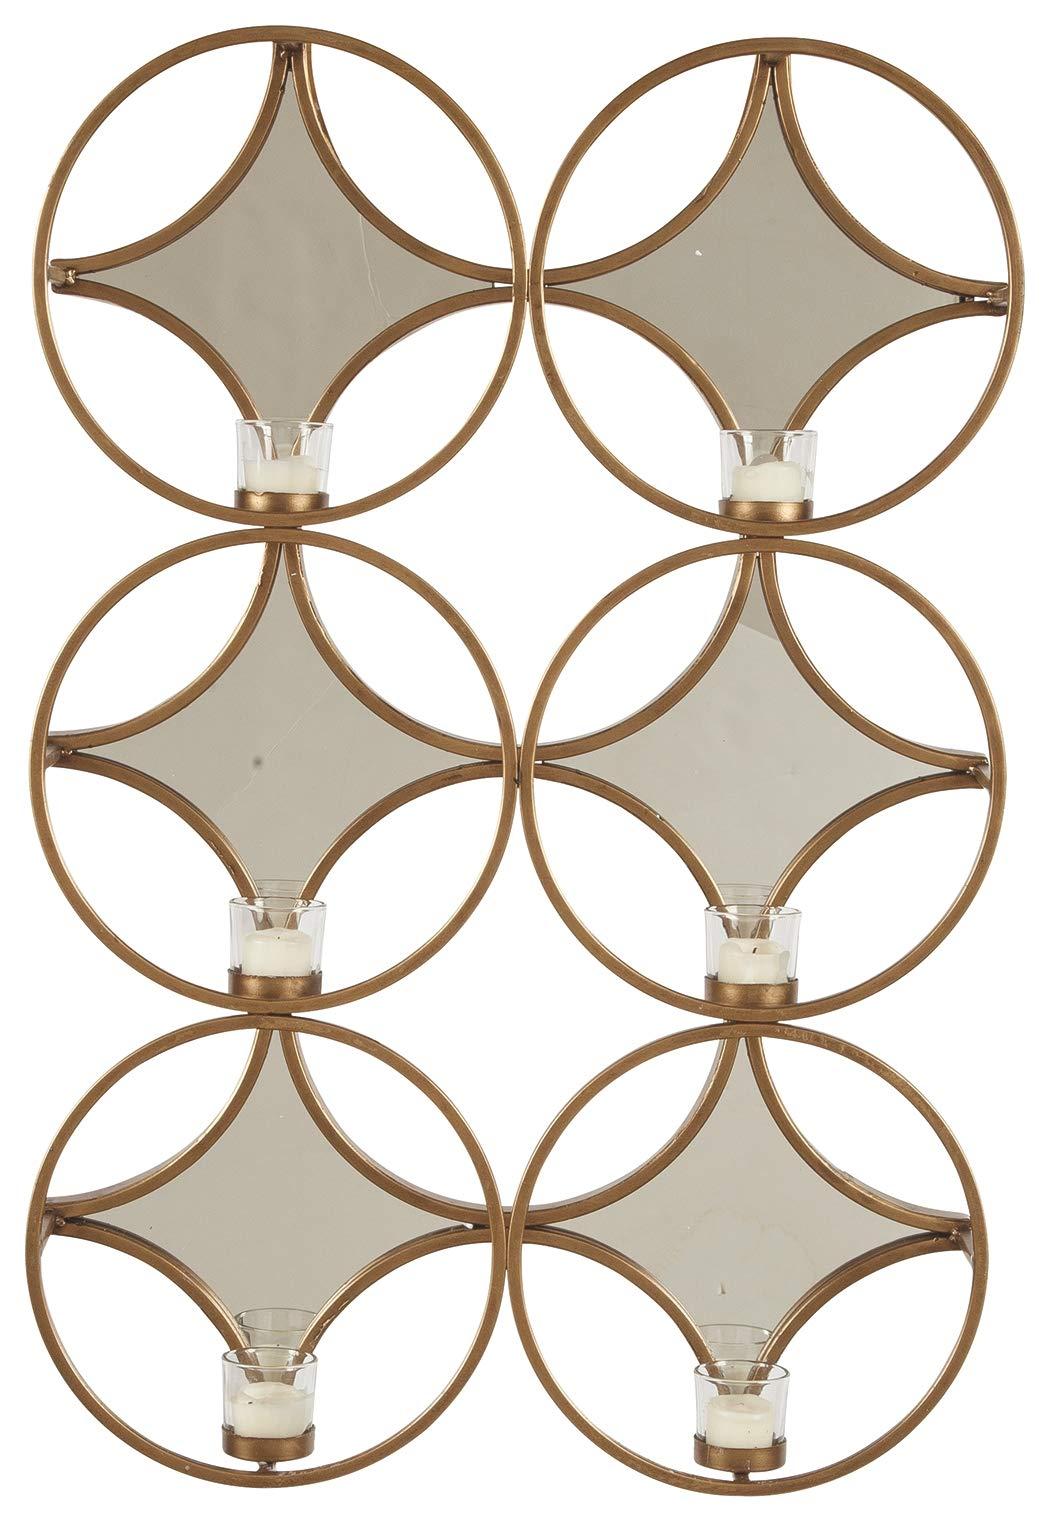 Ashley Furniture Signature Design - Emilia Wall Sconce - Contemporary - Gold Finish by Signature Design by Ashley